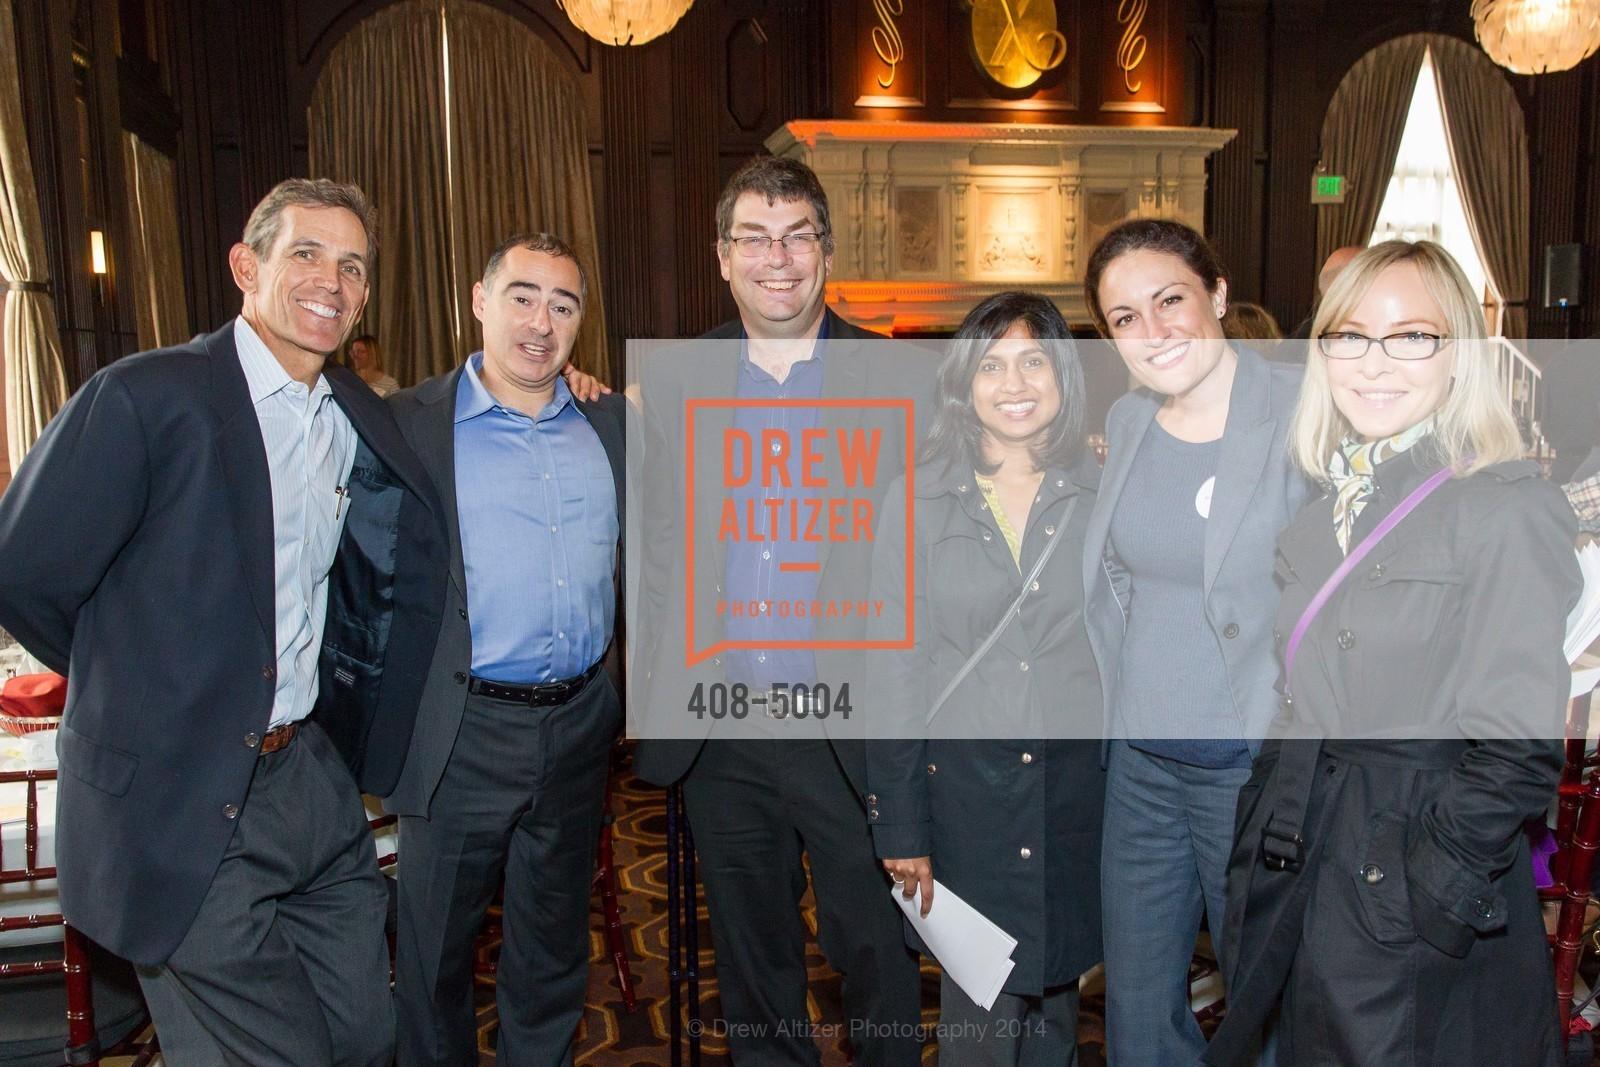 Marcus Stock, Larry Melillo, Jamie Draper, Yogi Naidoo, Annie Armstrong, Heather Hudak, Photo #408-5004